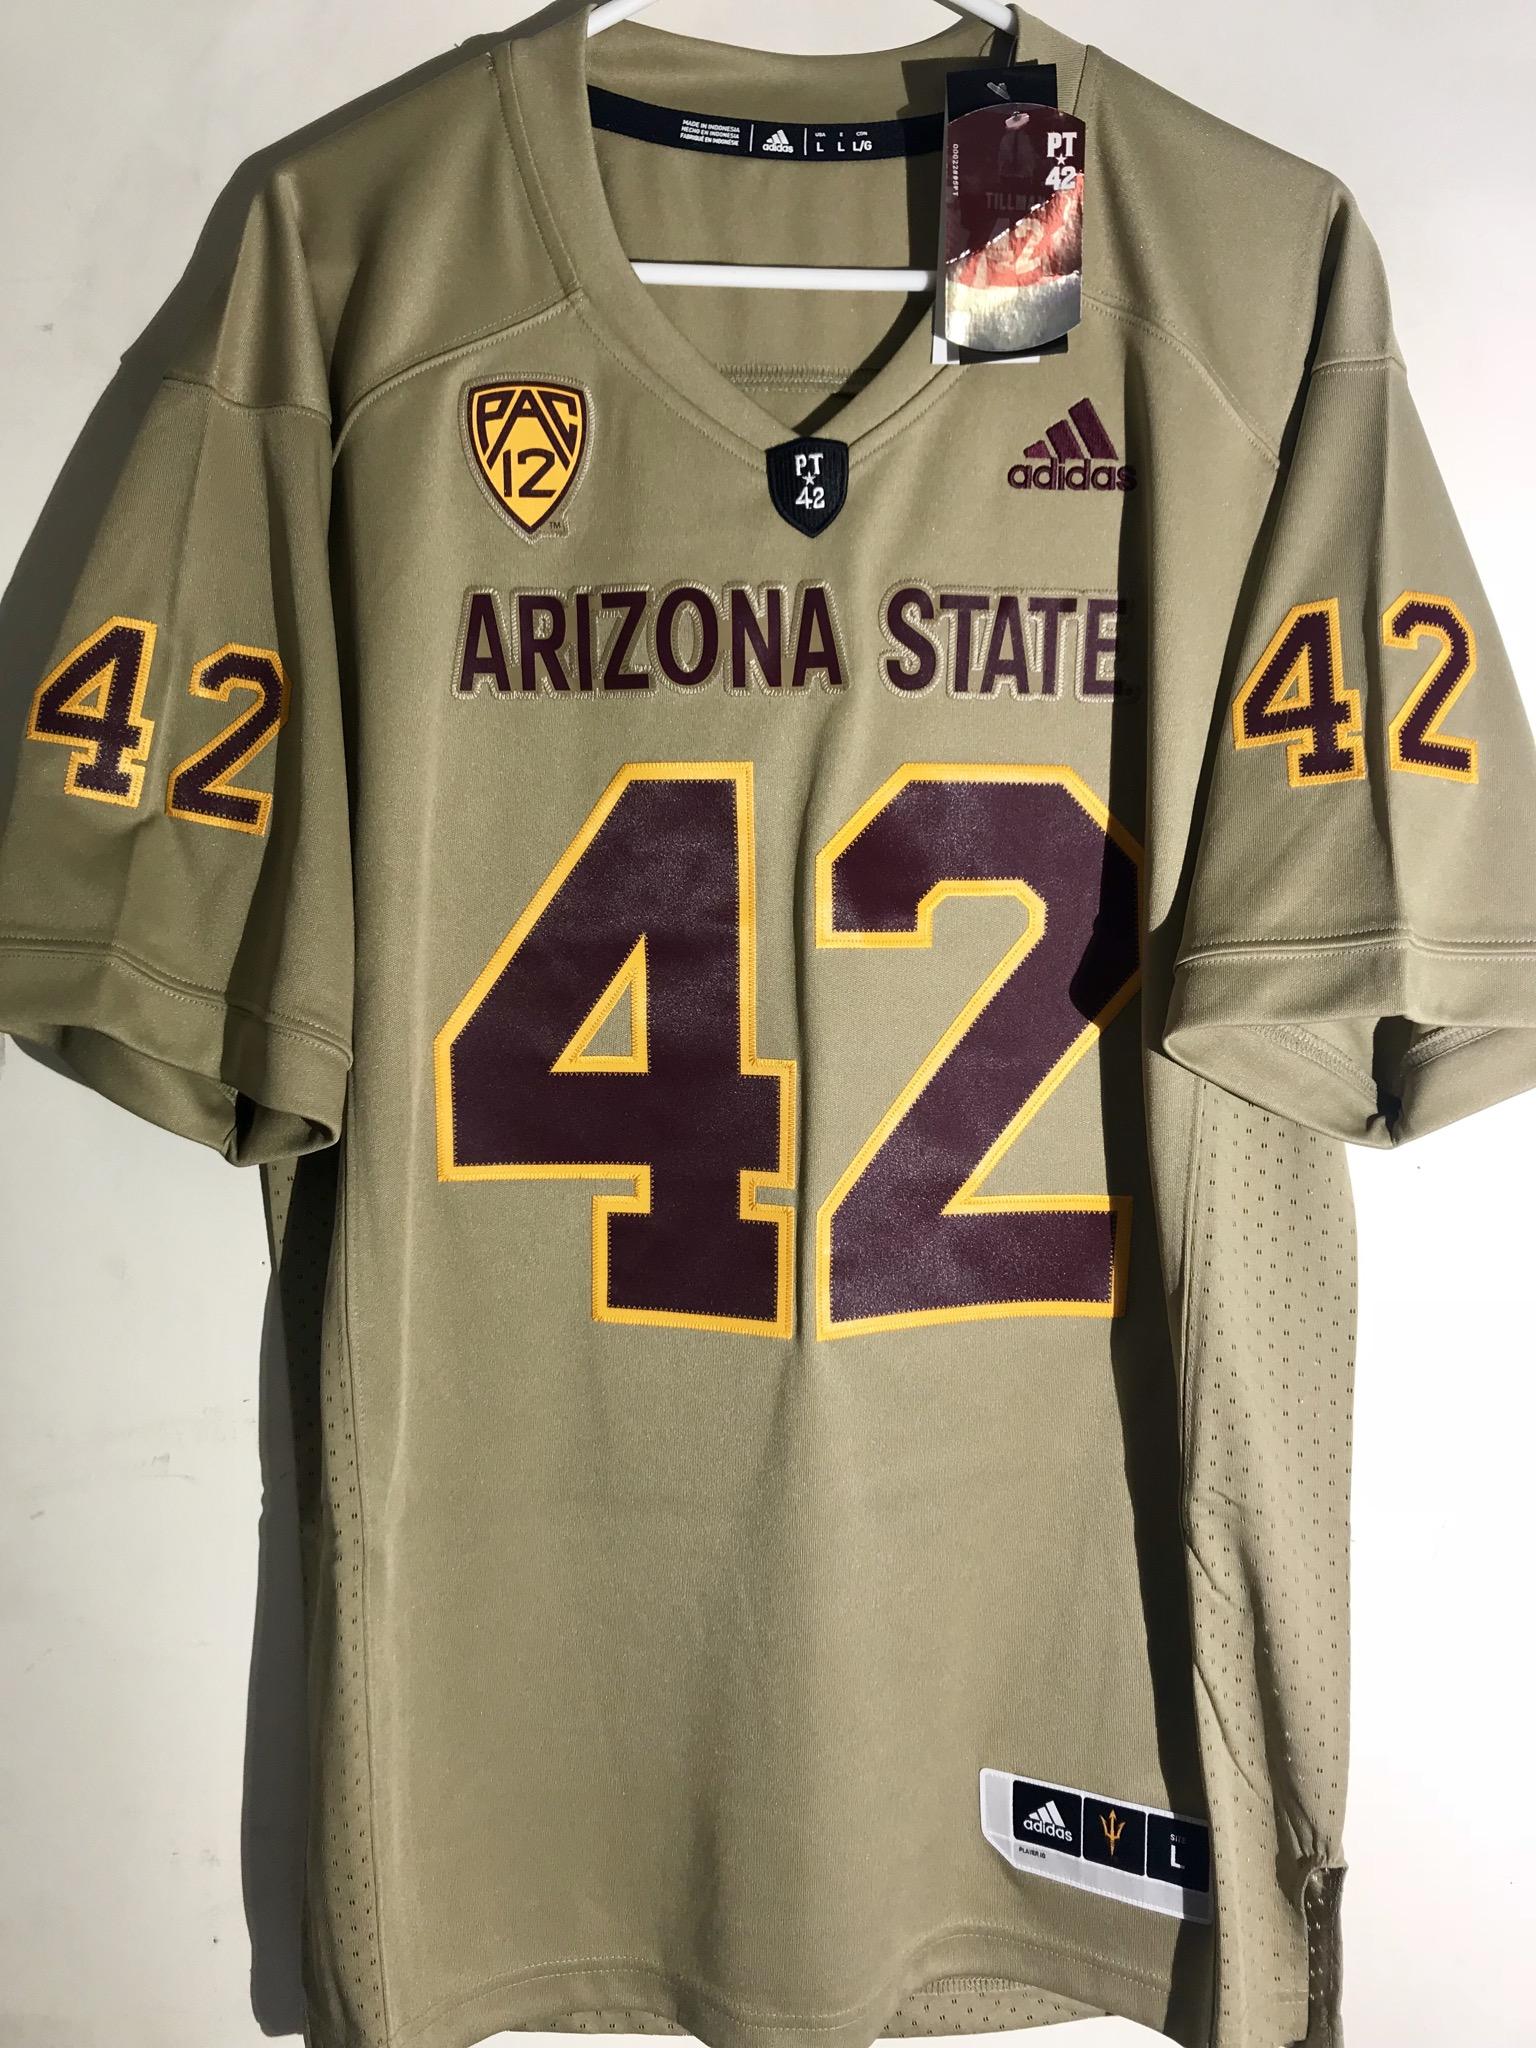 Adidas Premier NCAA Jersey Arizona State Sun Devils Pat Tillman ...